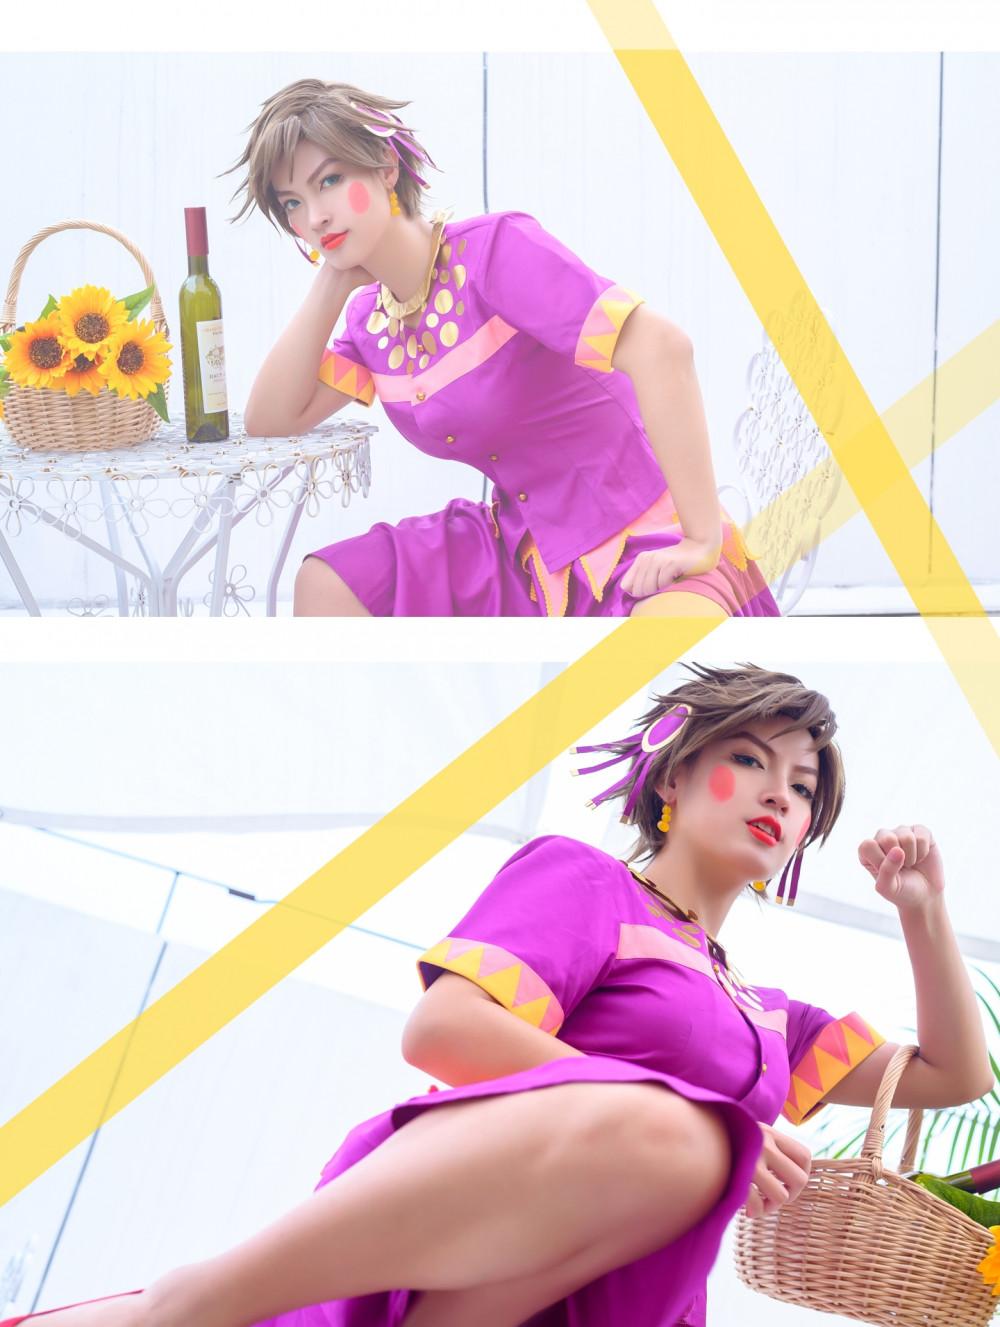 《JoJo的奇妙冒險》女裝佬大龍舌蘭姑娘 5